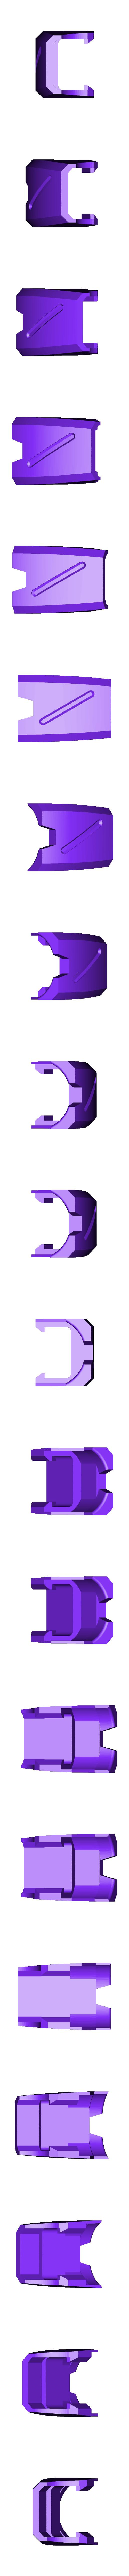 LegT2_Right_08_OliveGreen.stl Download STL file Heavy Gun Walker • 3D print design, Jwoong